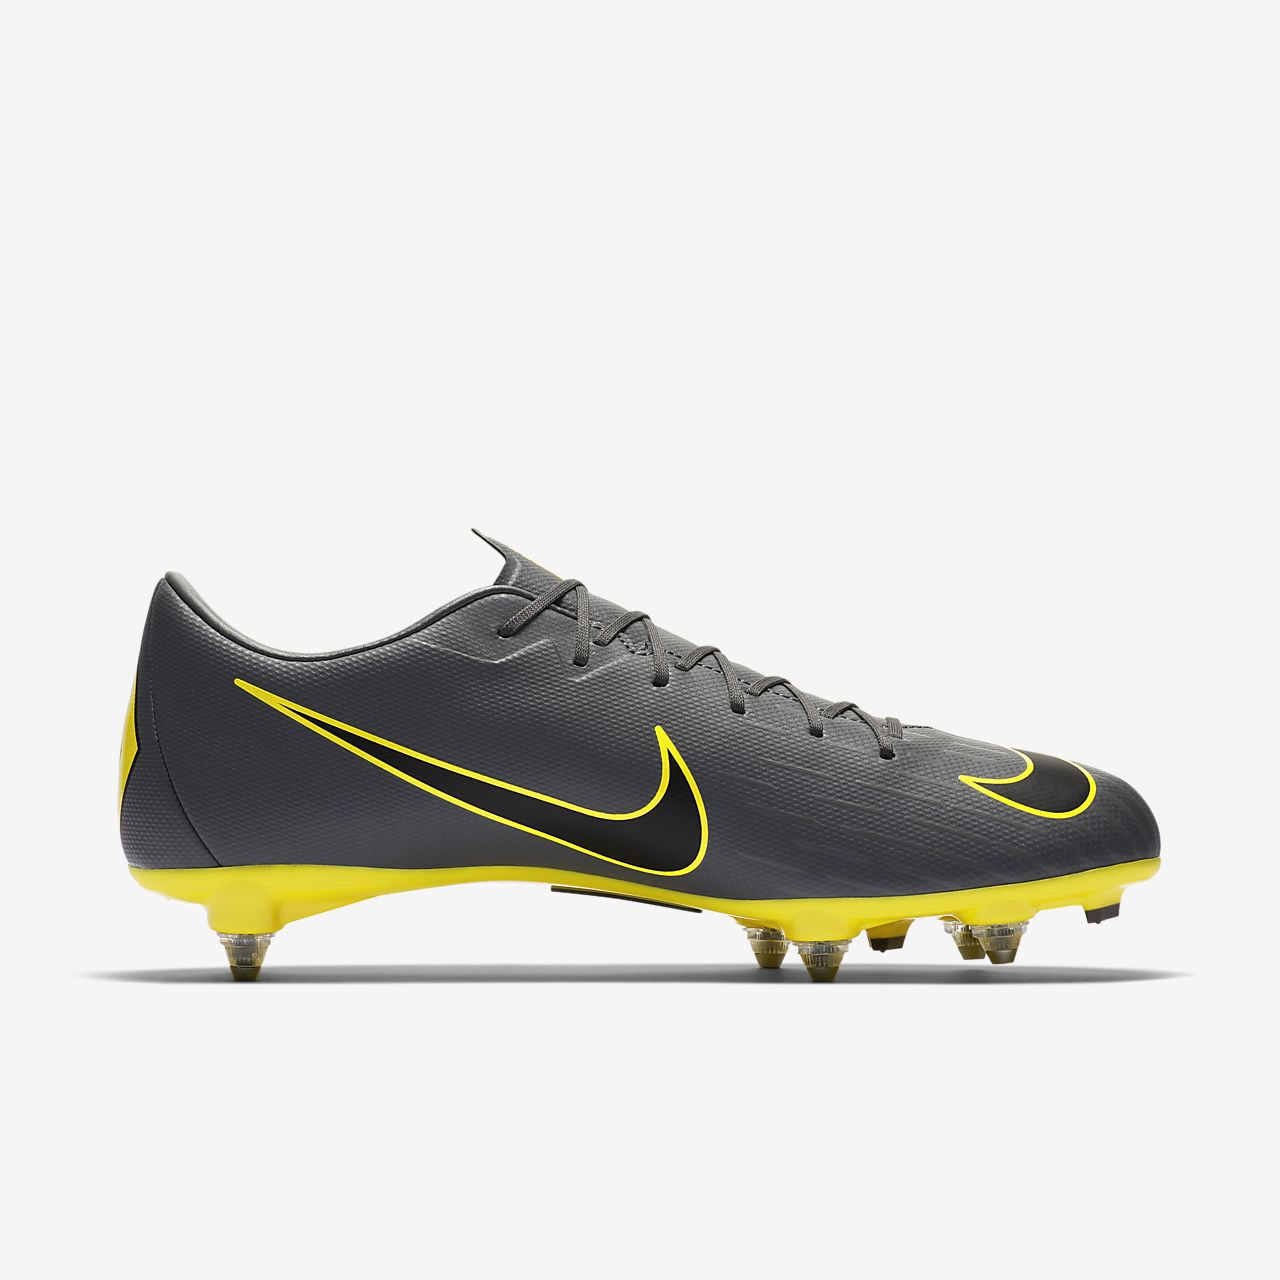 4cde2575bde Nike Mercurial Vapor XII Academy SG-PRO Soft-Ground Football Boot ...